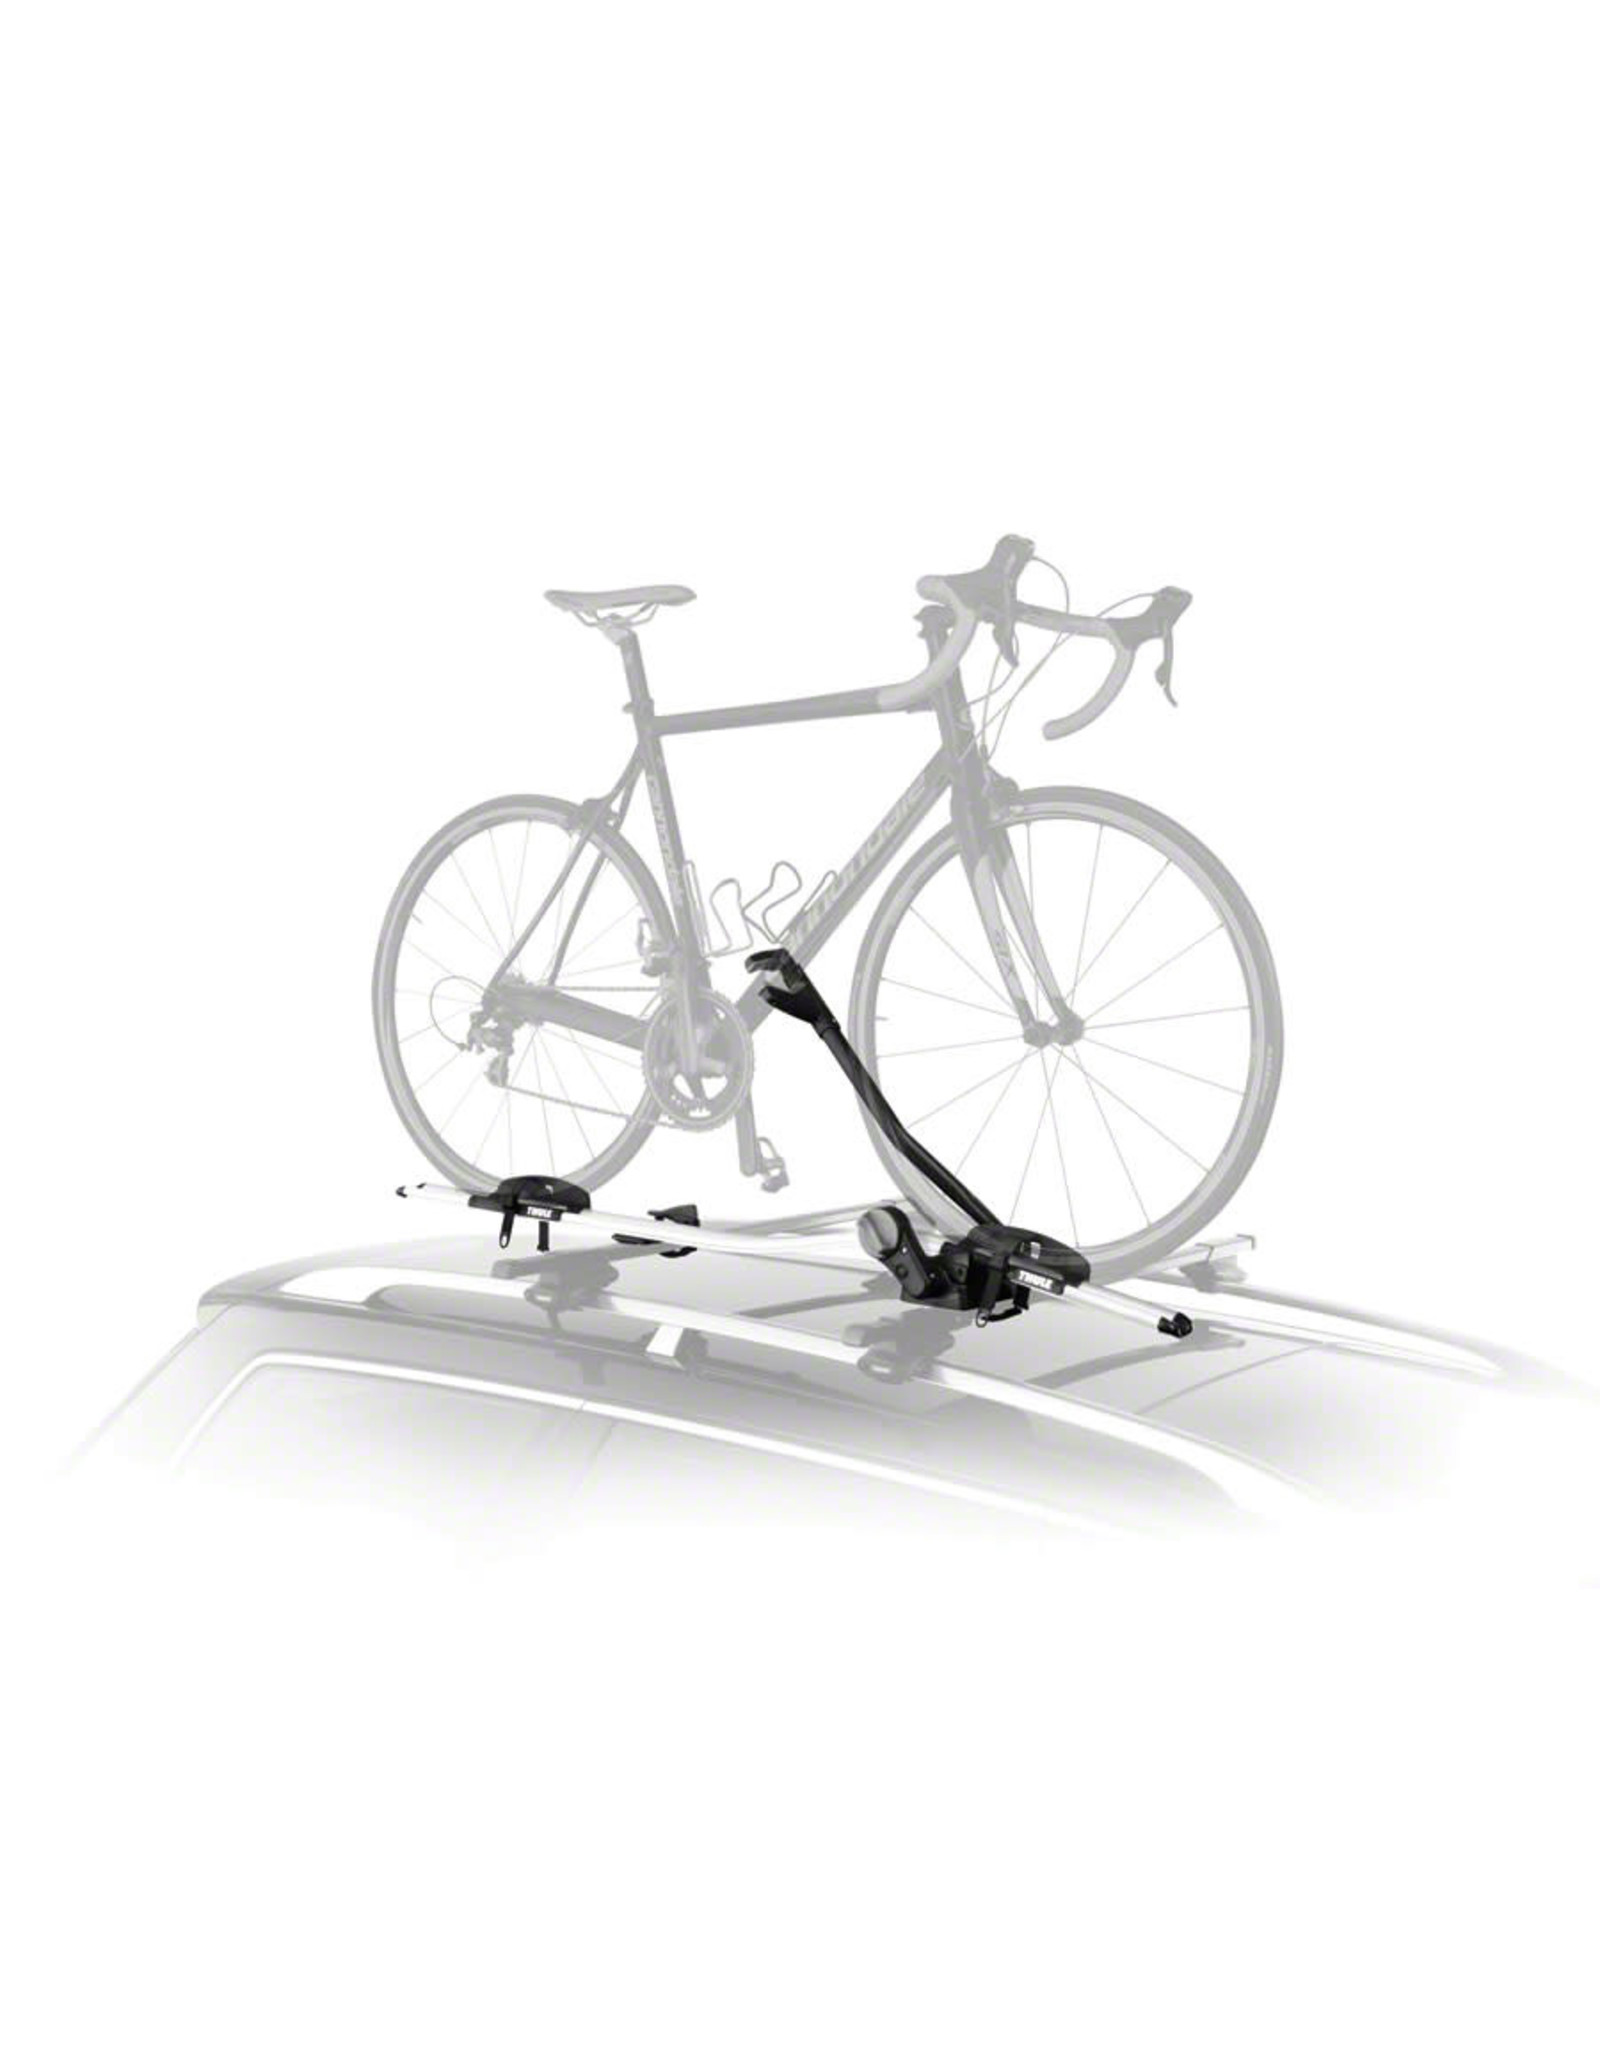 Thule Thule 598 Criterium Upright Bike Carrier; 1-Bike